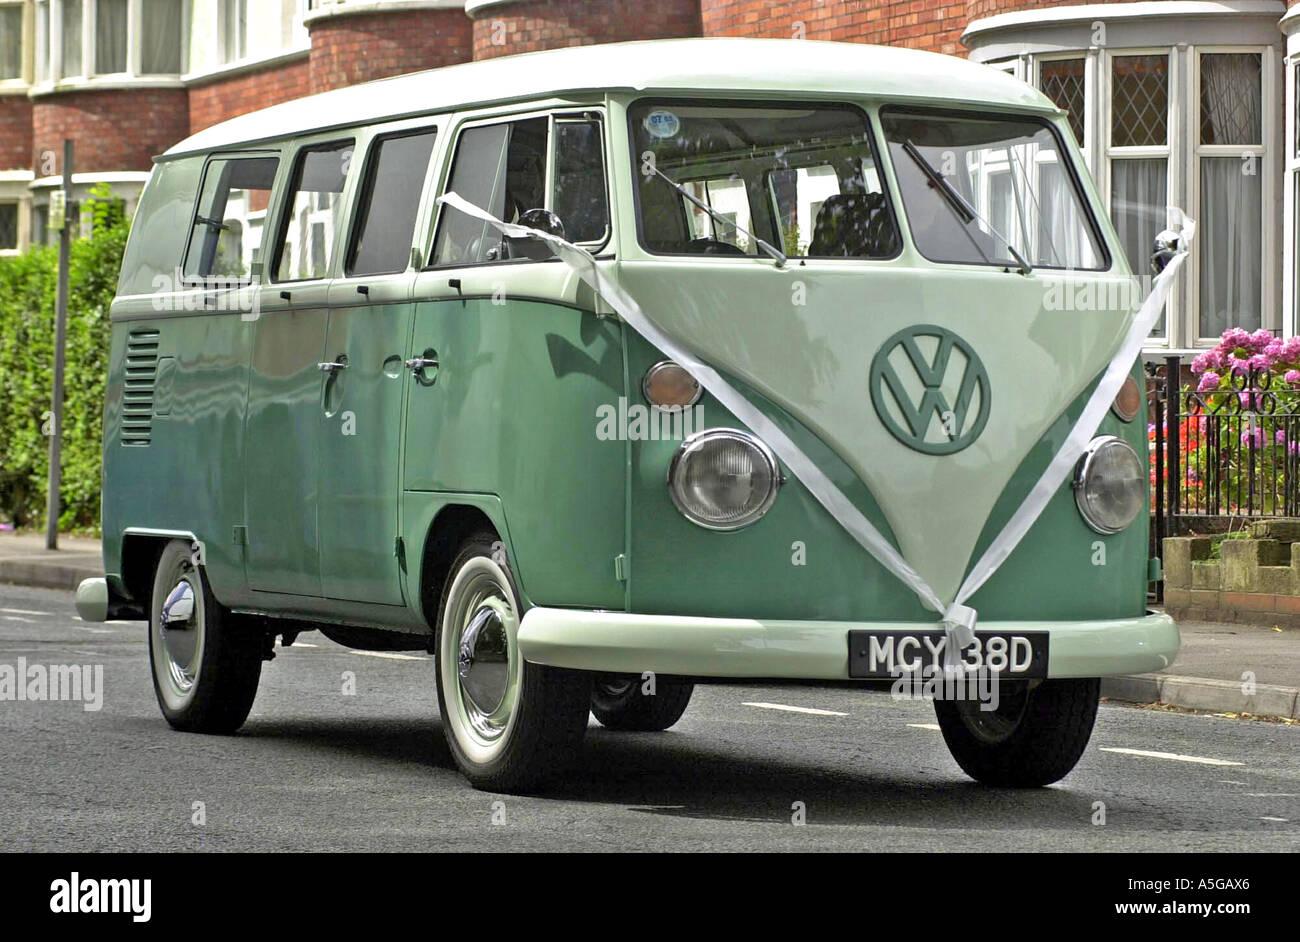 ancien camping car volkswagen cran partag avec noeud utilis comme v hicule de mariage banque. Black Bedroom Furniture Sets. Home Design Ideas